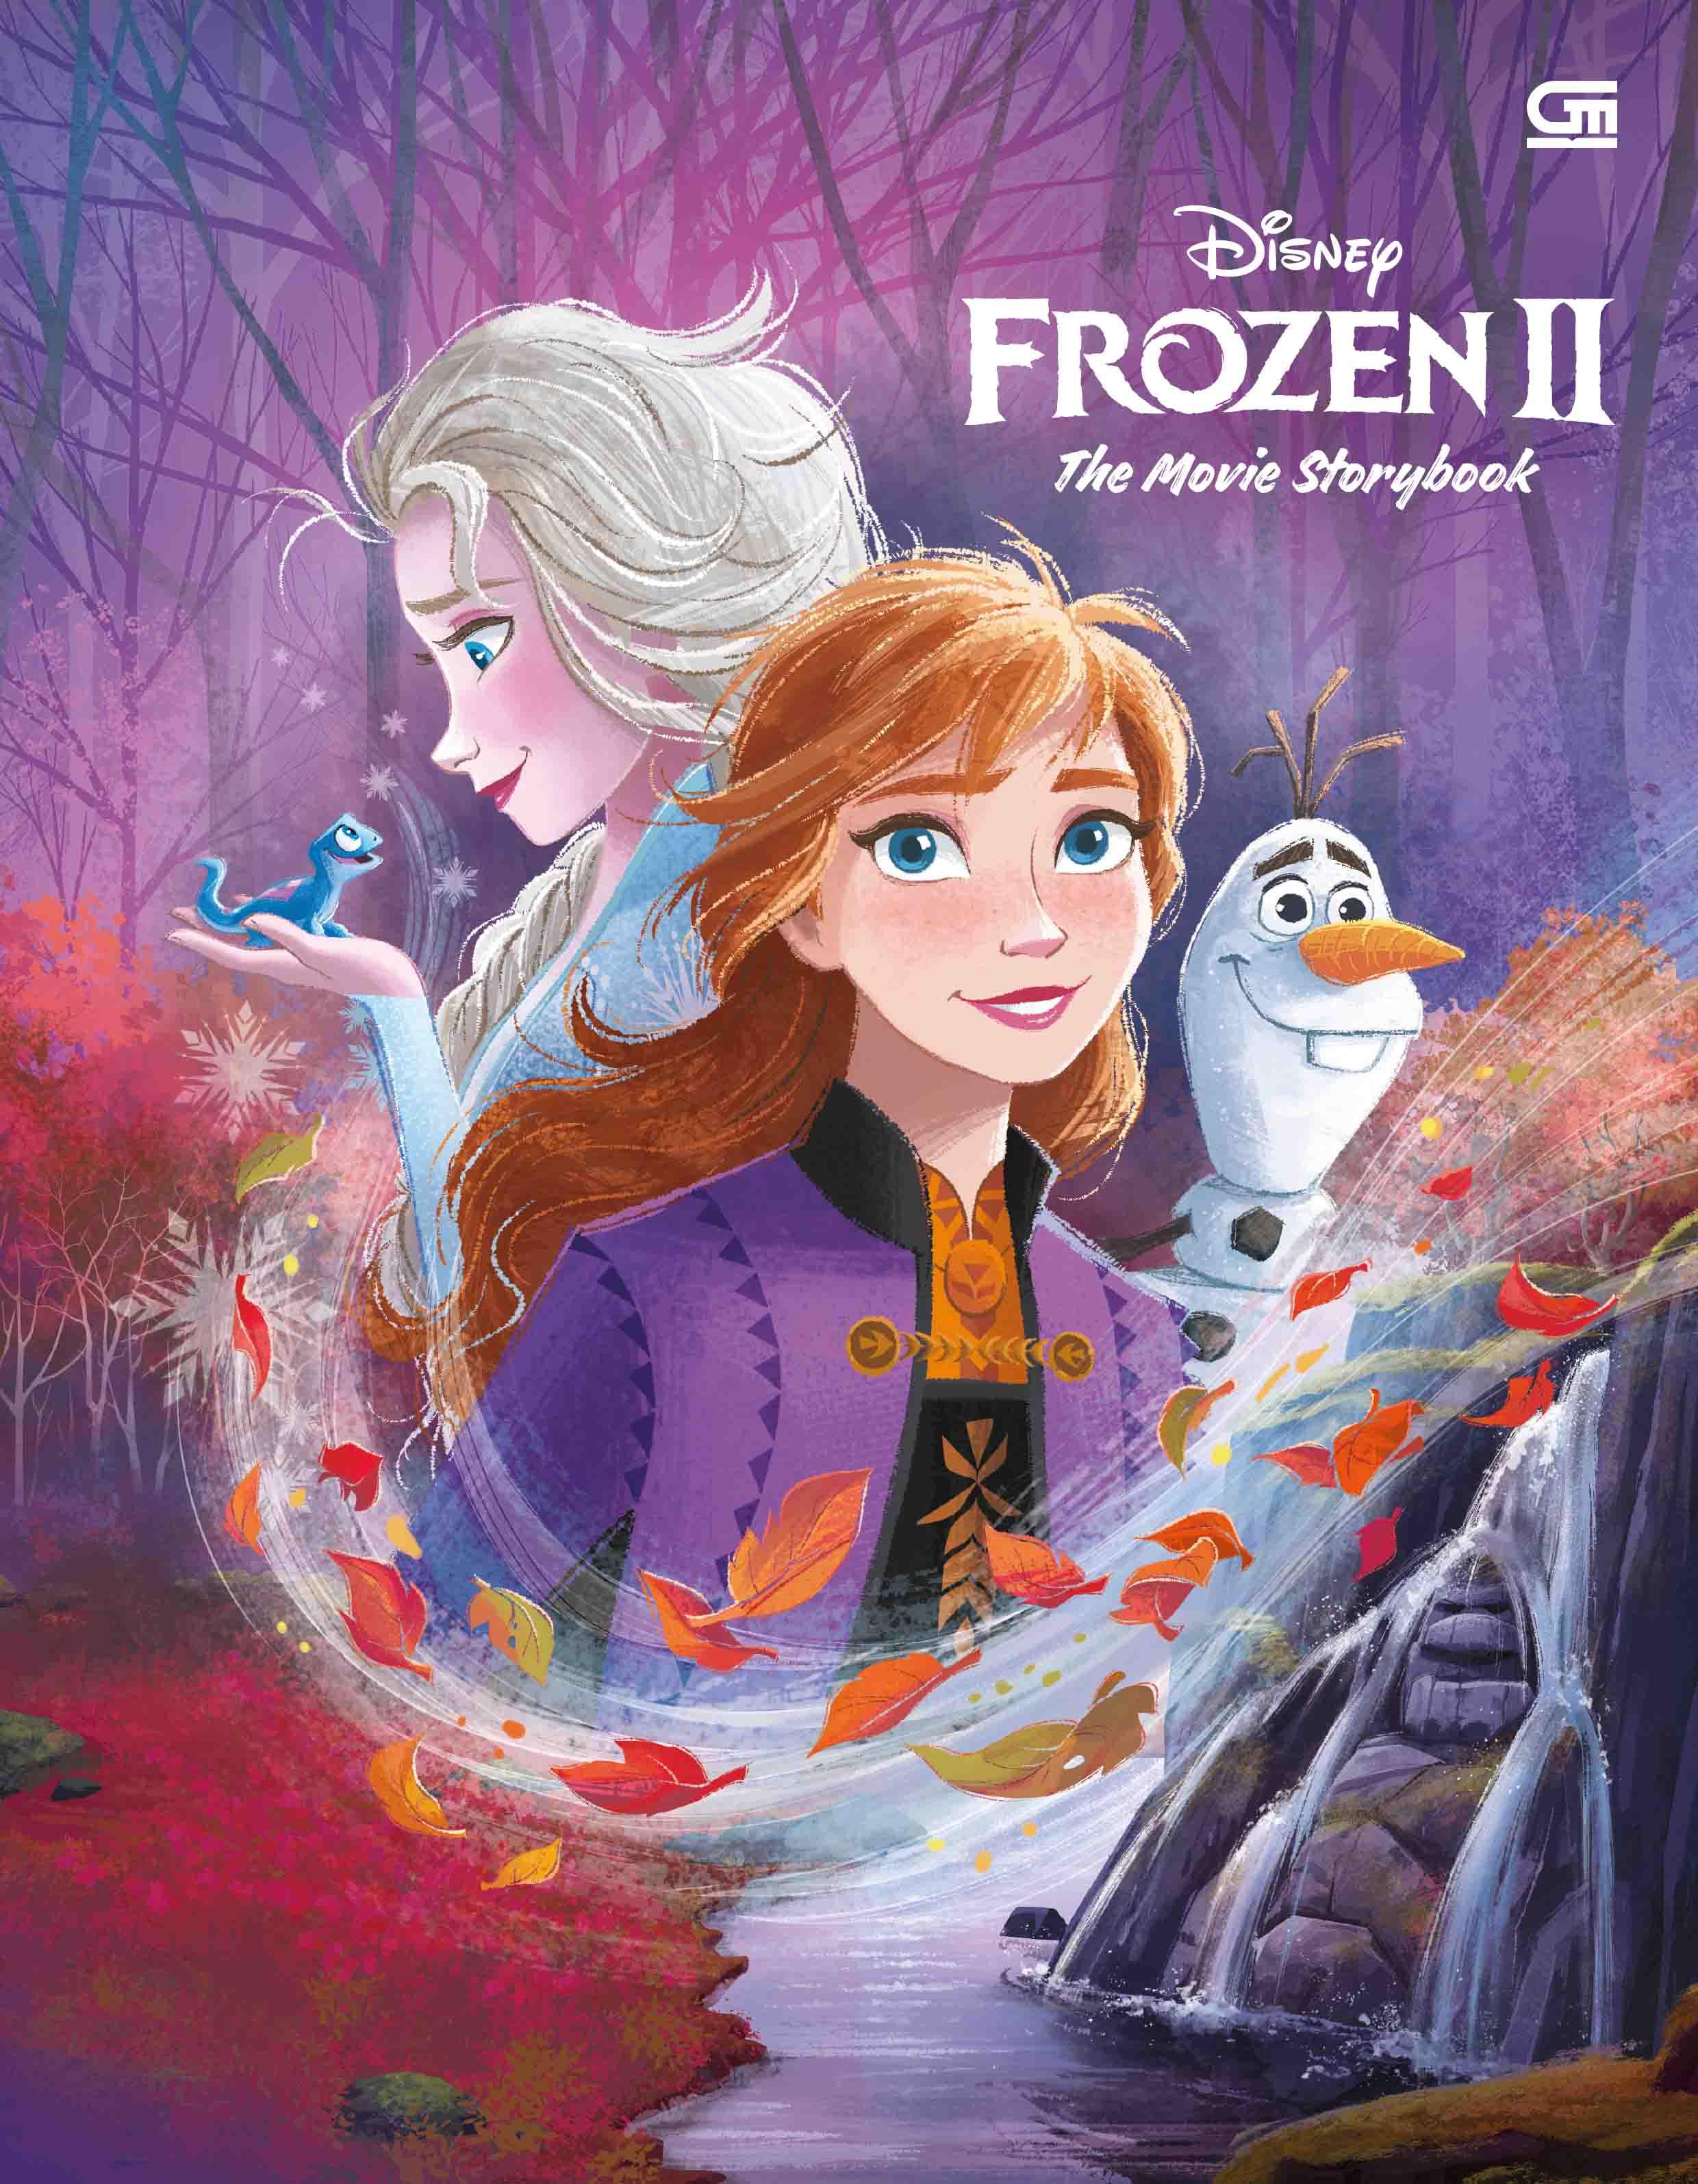 Frozen II: The Movie Storybook